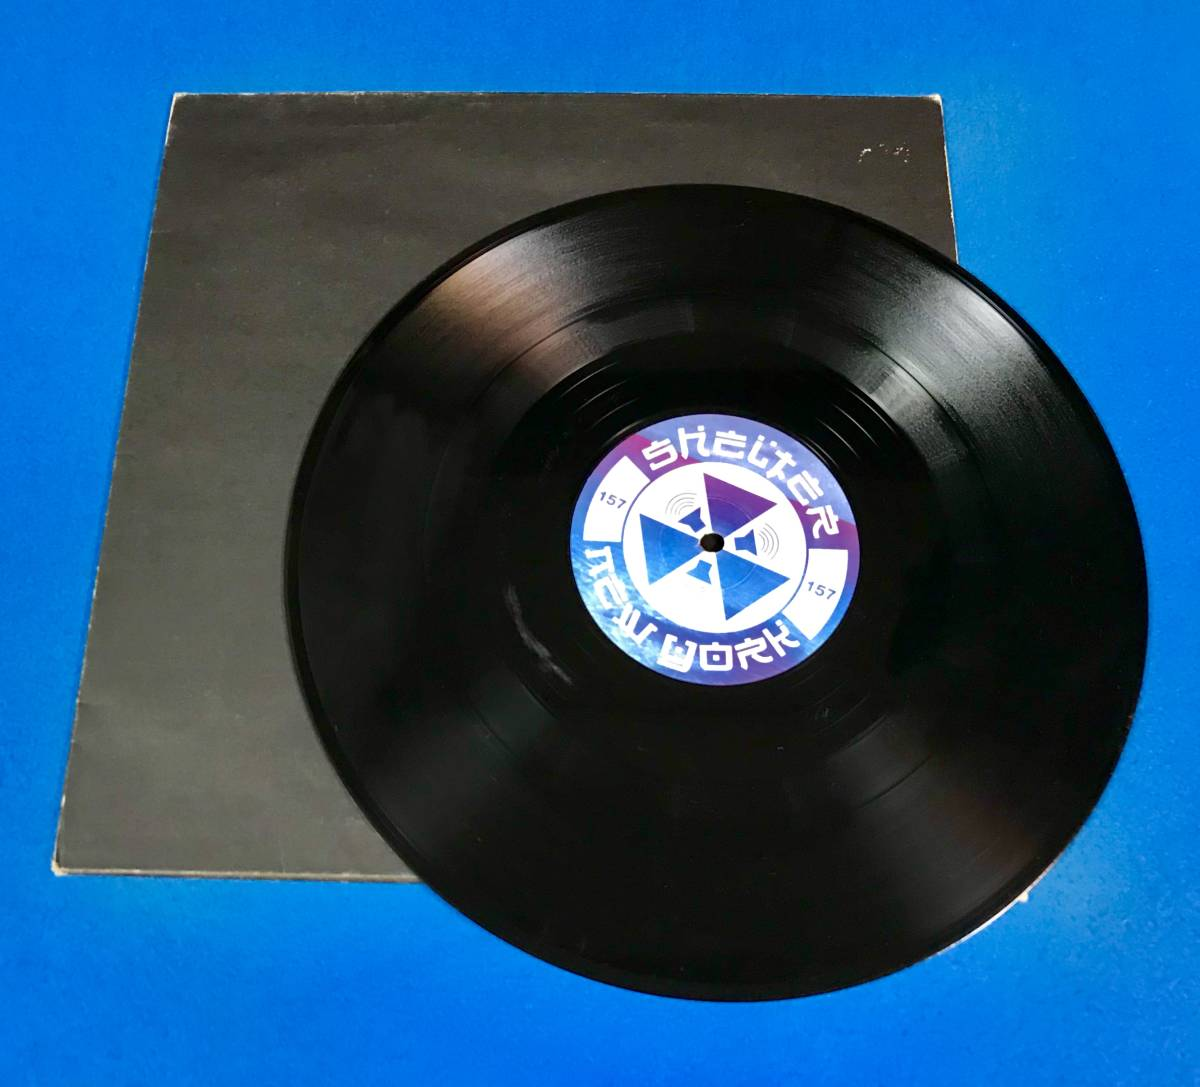 【HOUSE】JAVEMEYER//AGUA//SHELTER RECORDS//SHL-1045//TIMMY REGISFORD//12INCH VINYL/US/LOFT/GARAGE_画像3